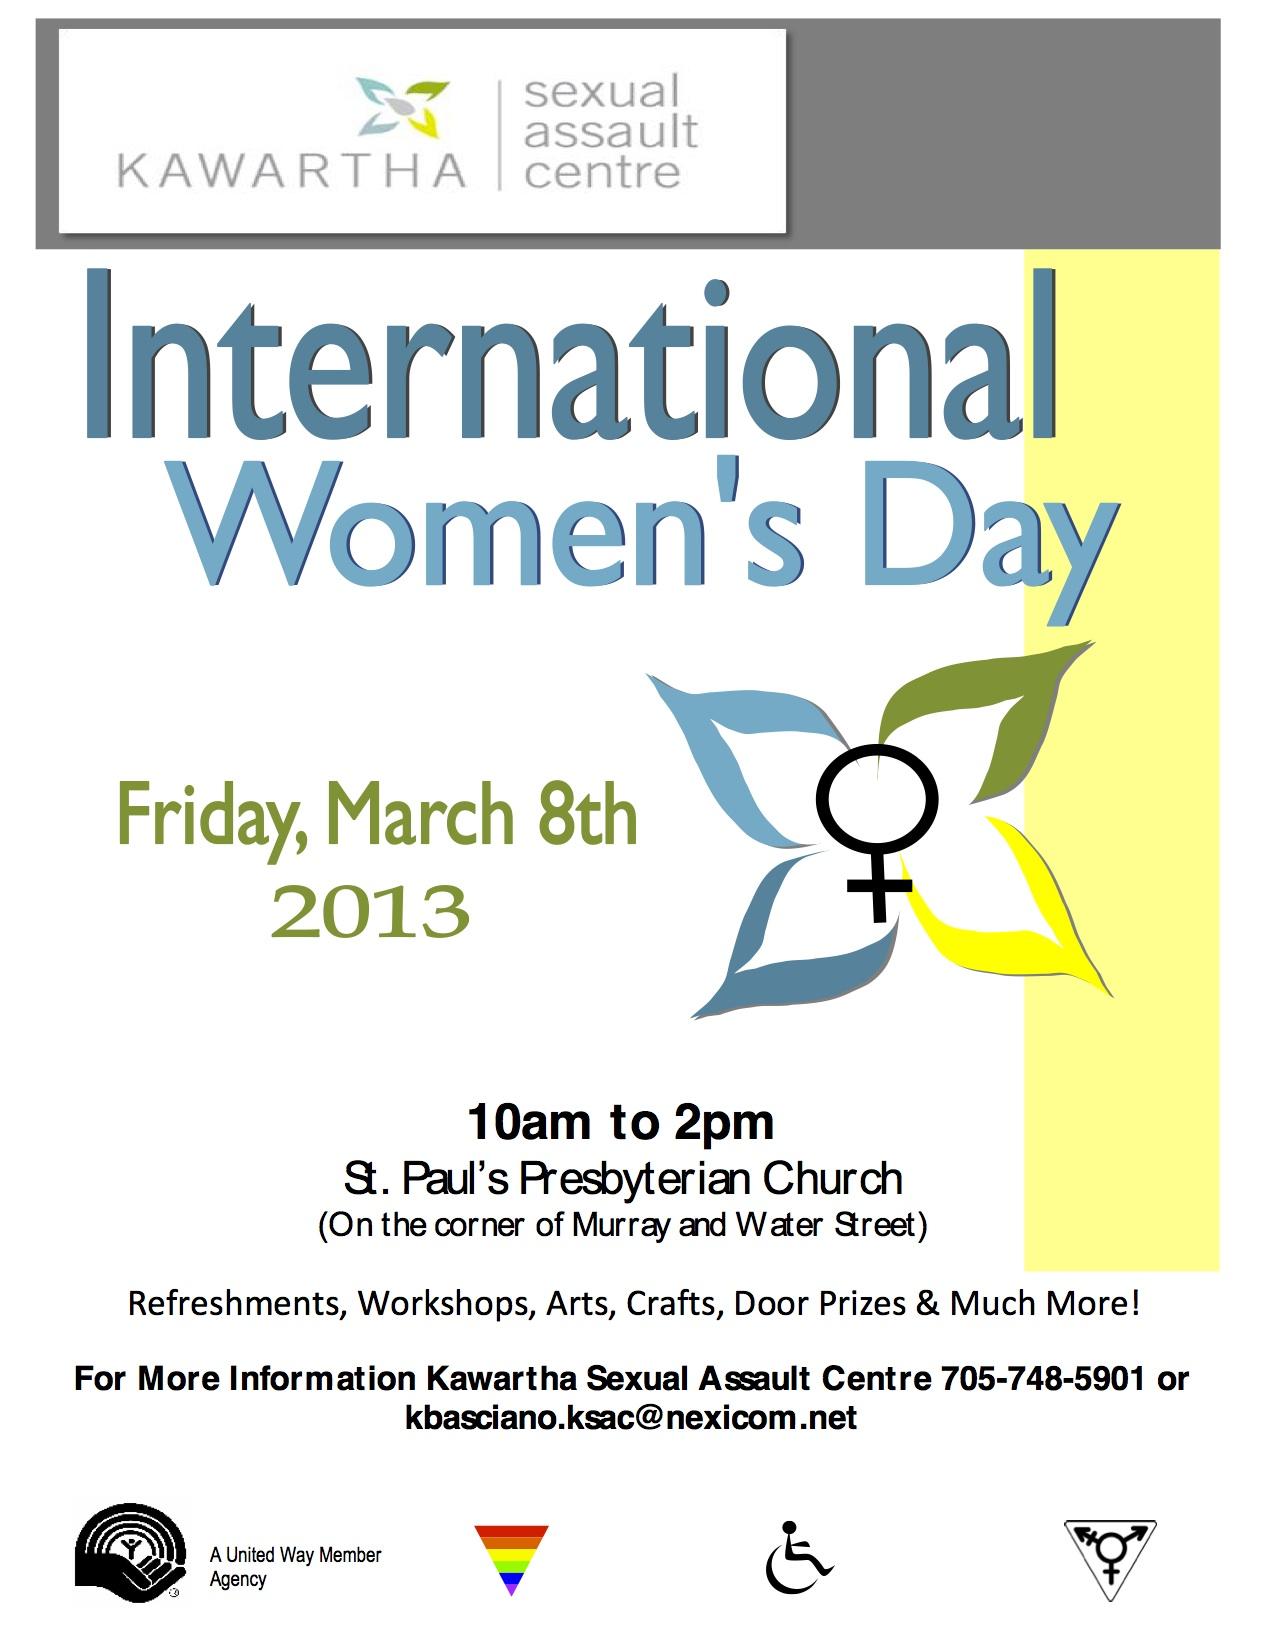 International Women's Day Events around the Region | OPSEU